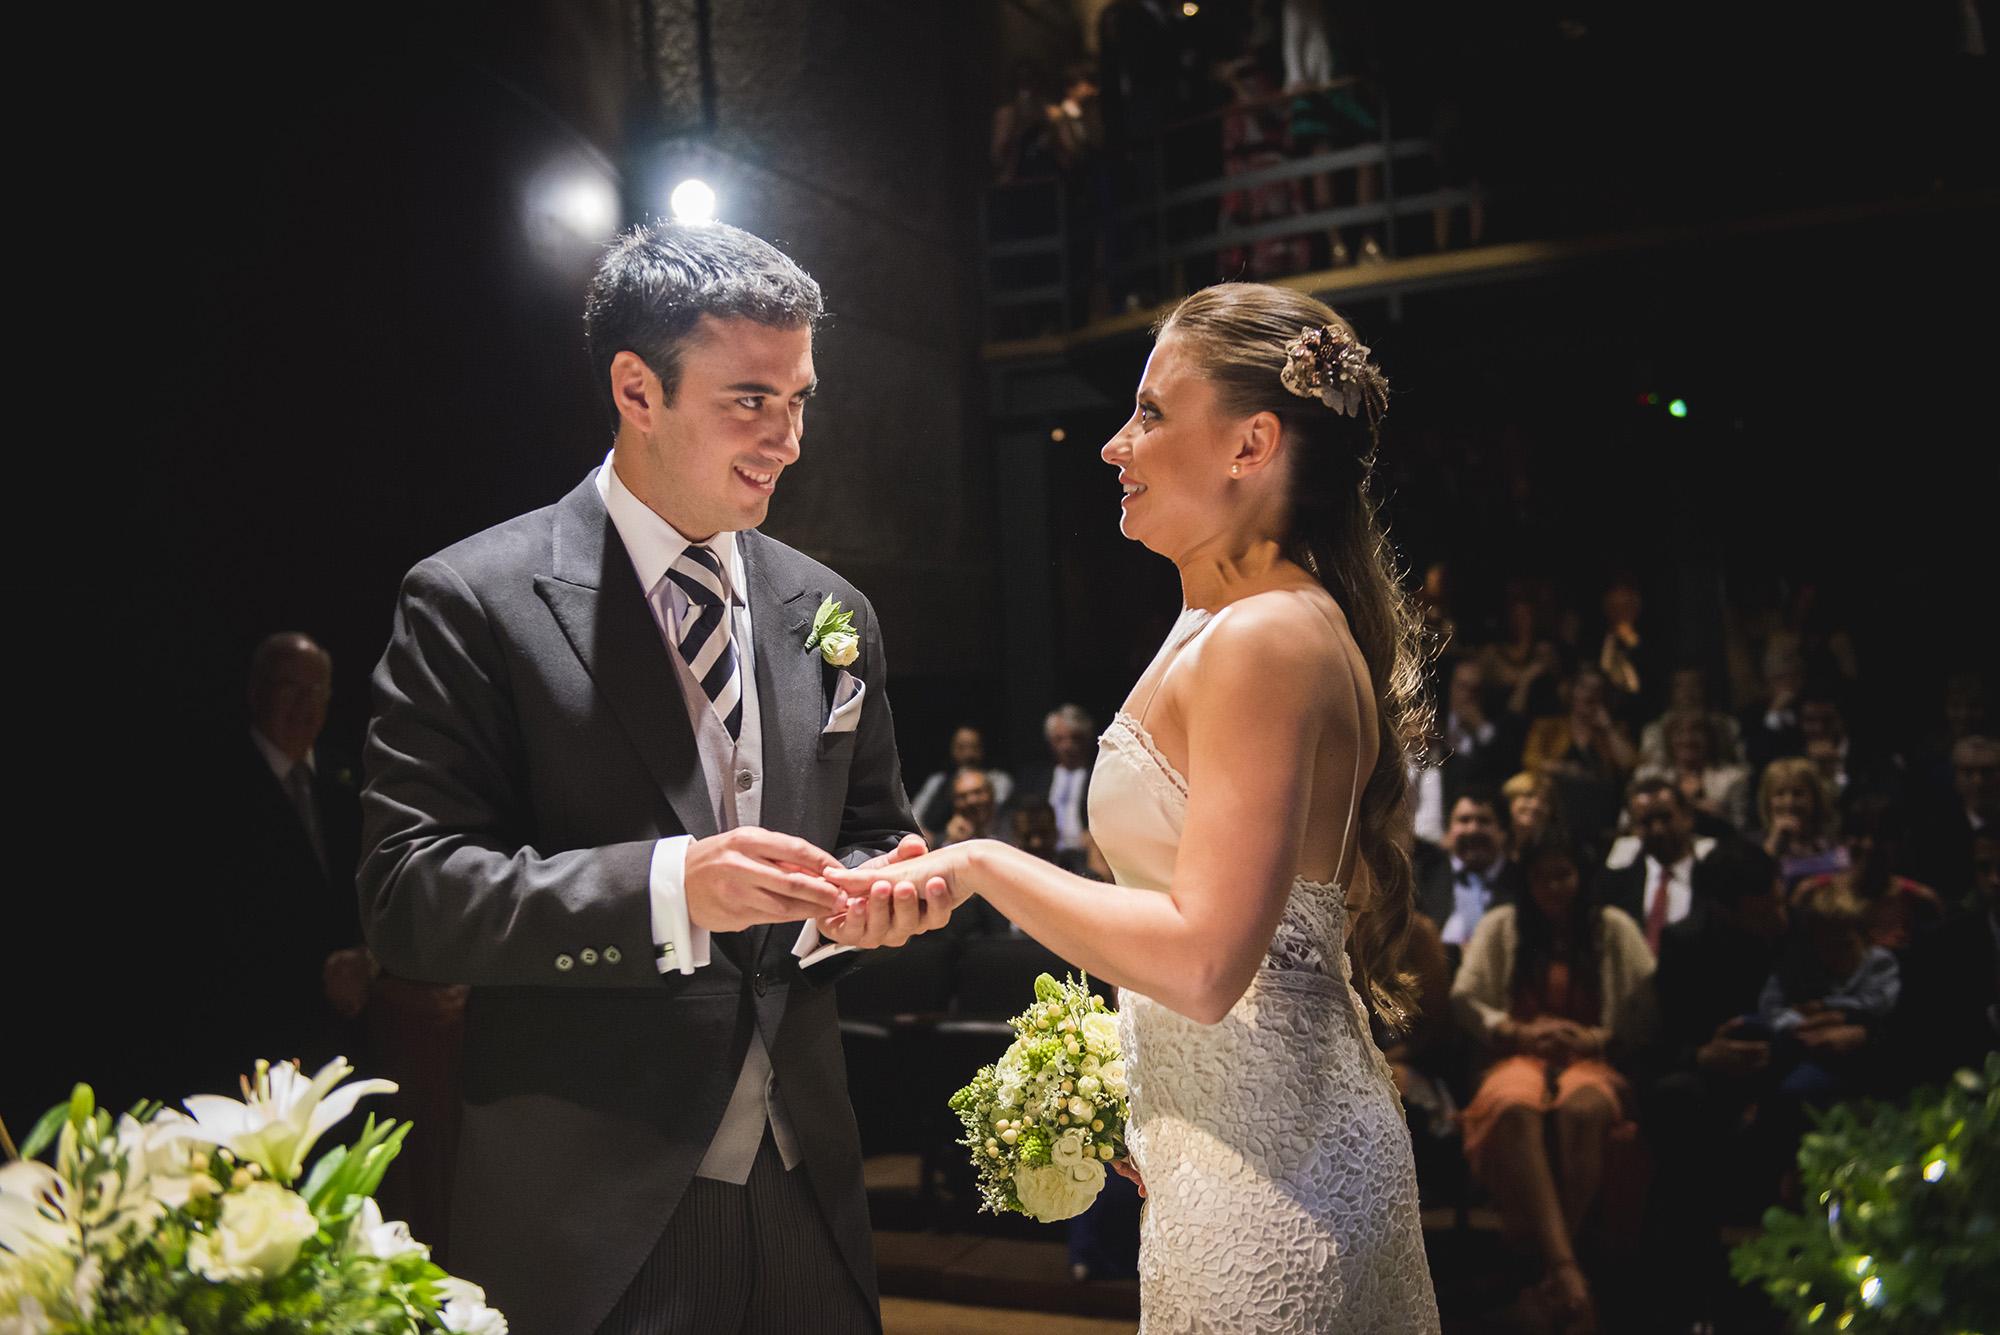 patricia-riba-casamiento-montevideo-uruguay-lindolfo-40